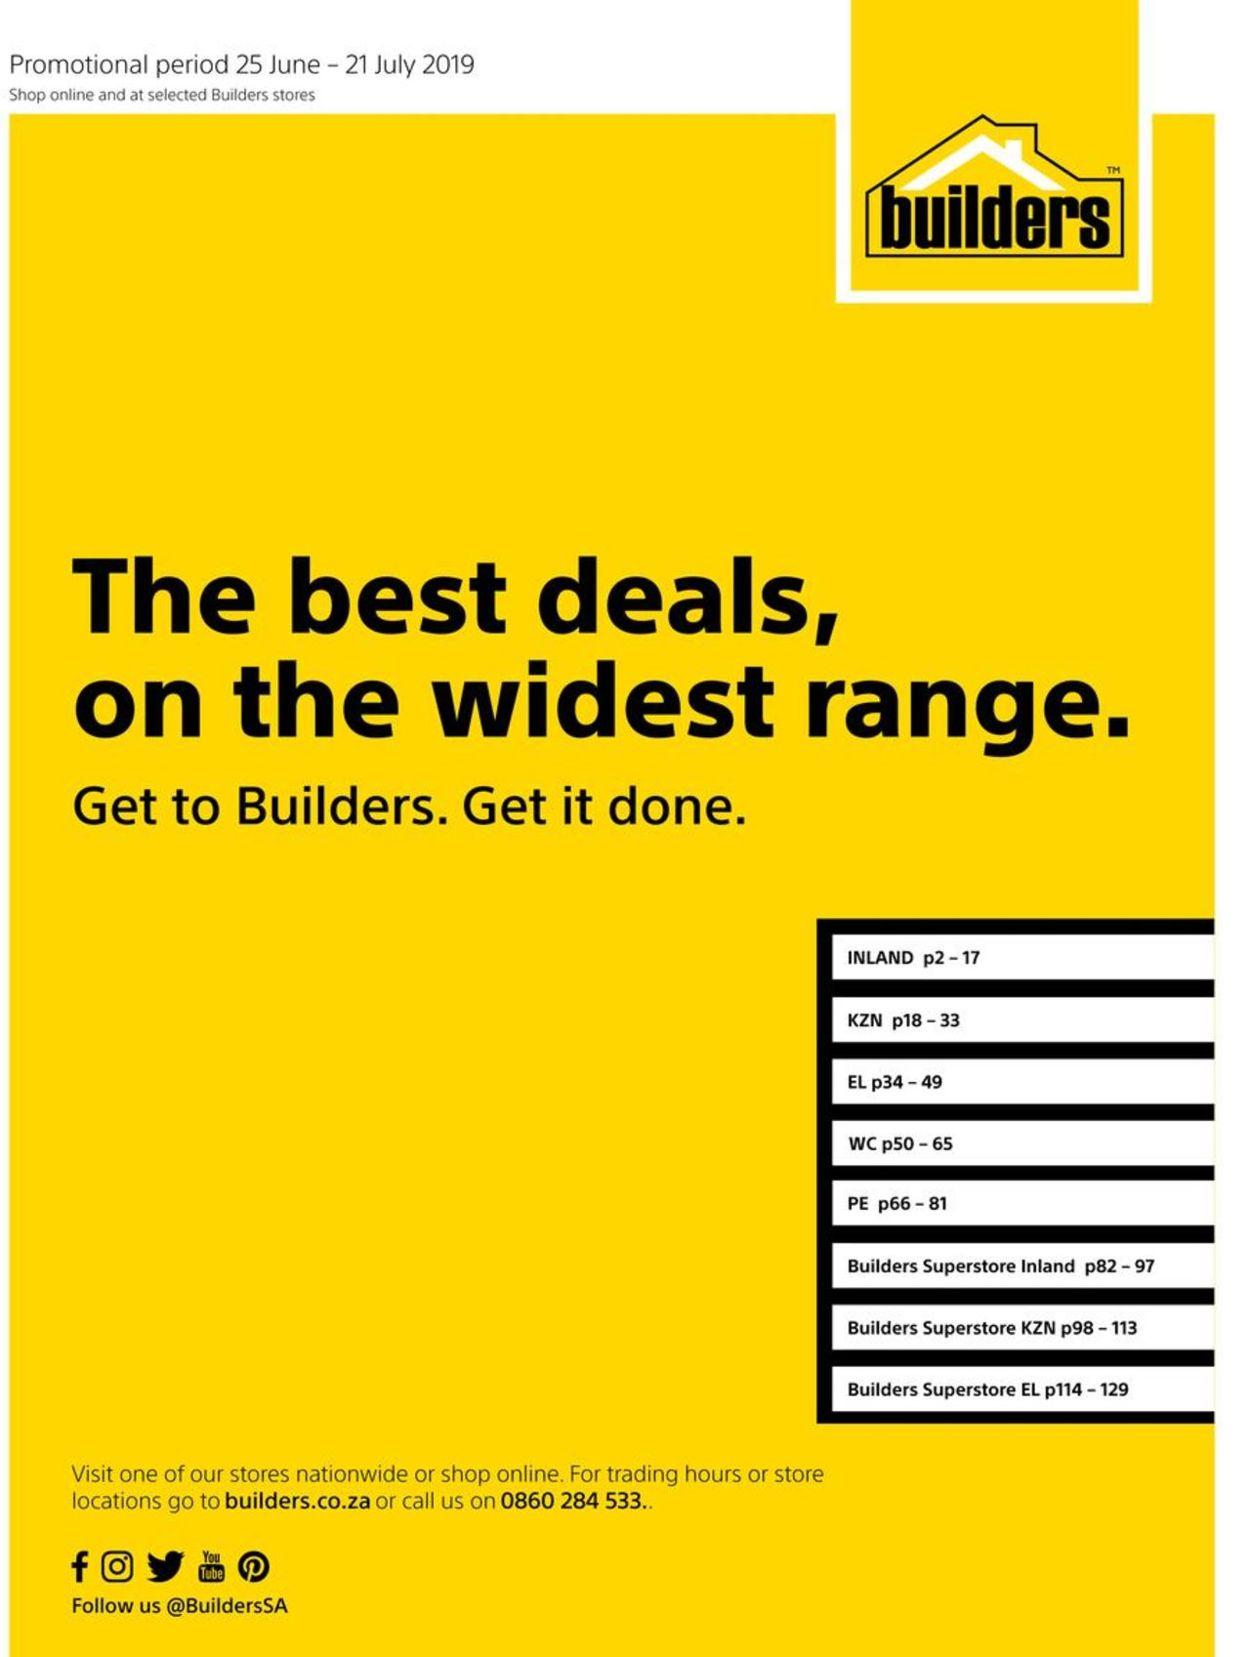 Builders Warehouse Catalogue - 2019/06/25-2019/07/21